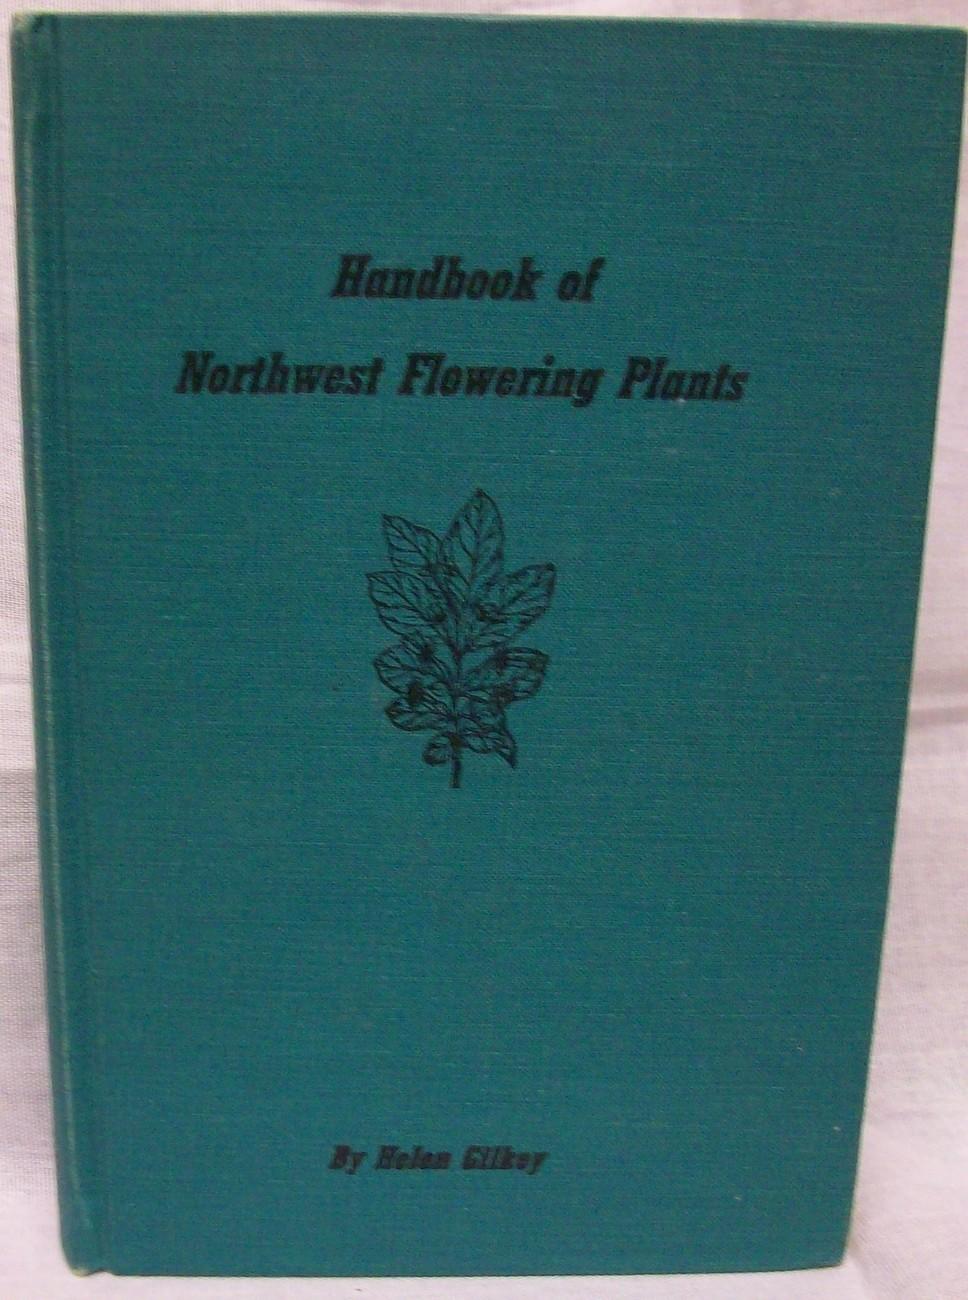 Handbook of Northwest Flowering Plants by Gilkey, Helen